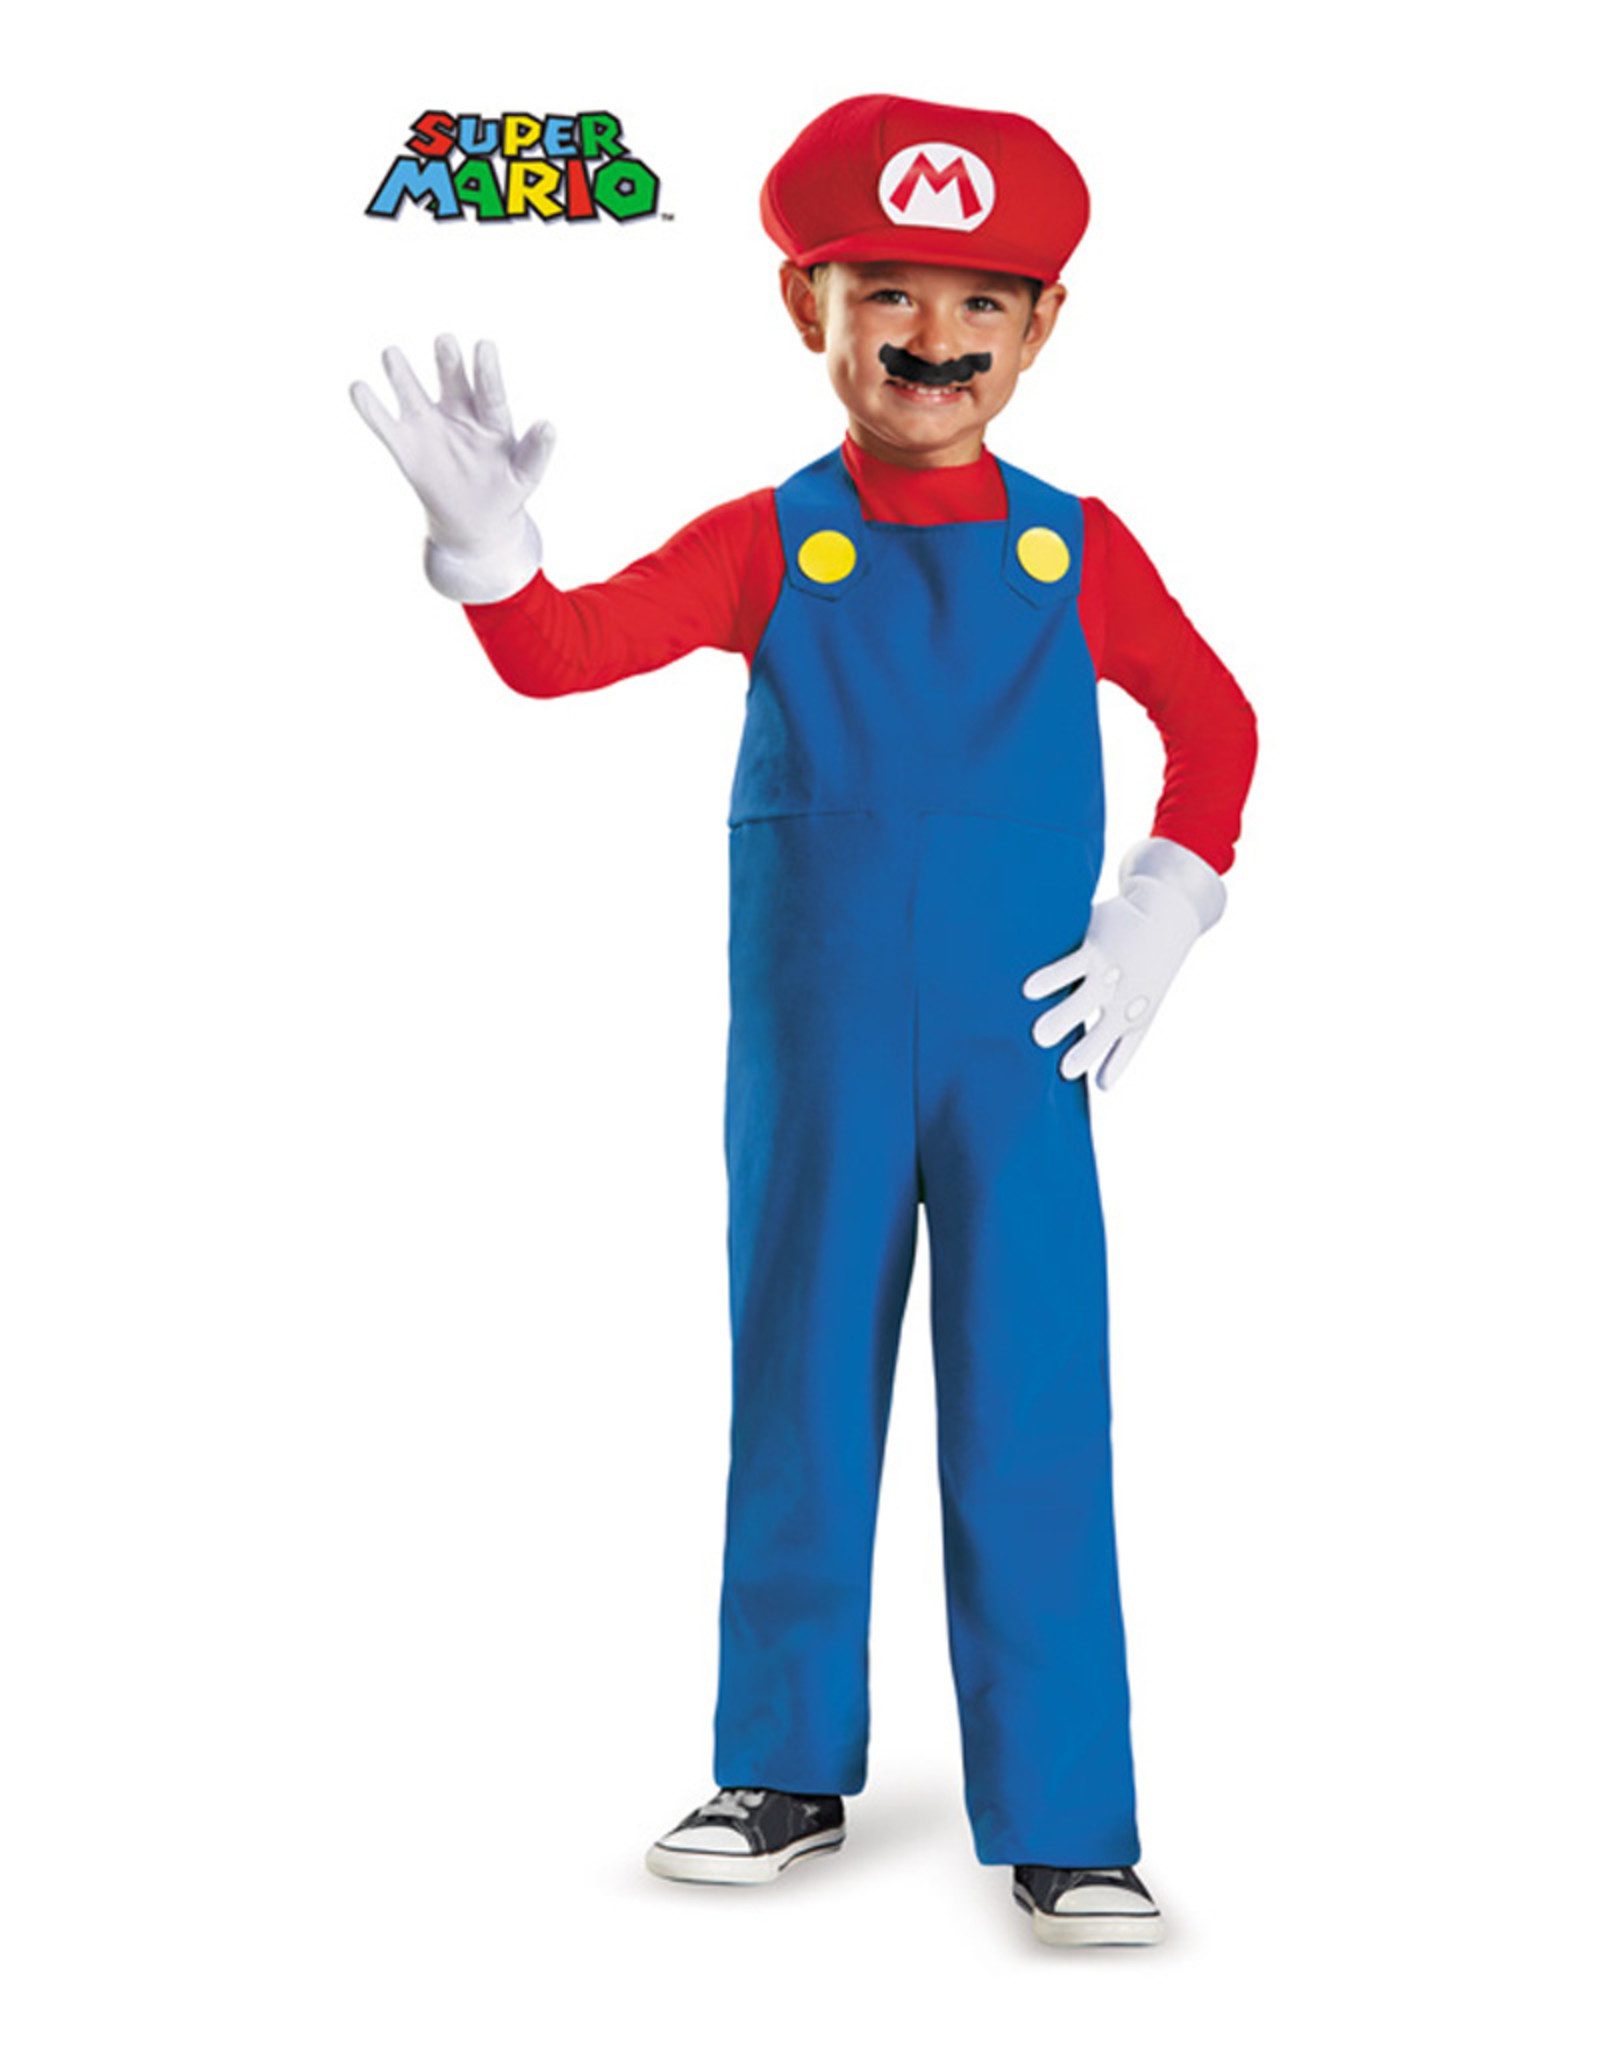 Mario Deluxe Costume - Toddler